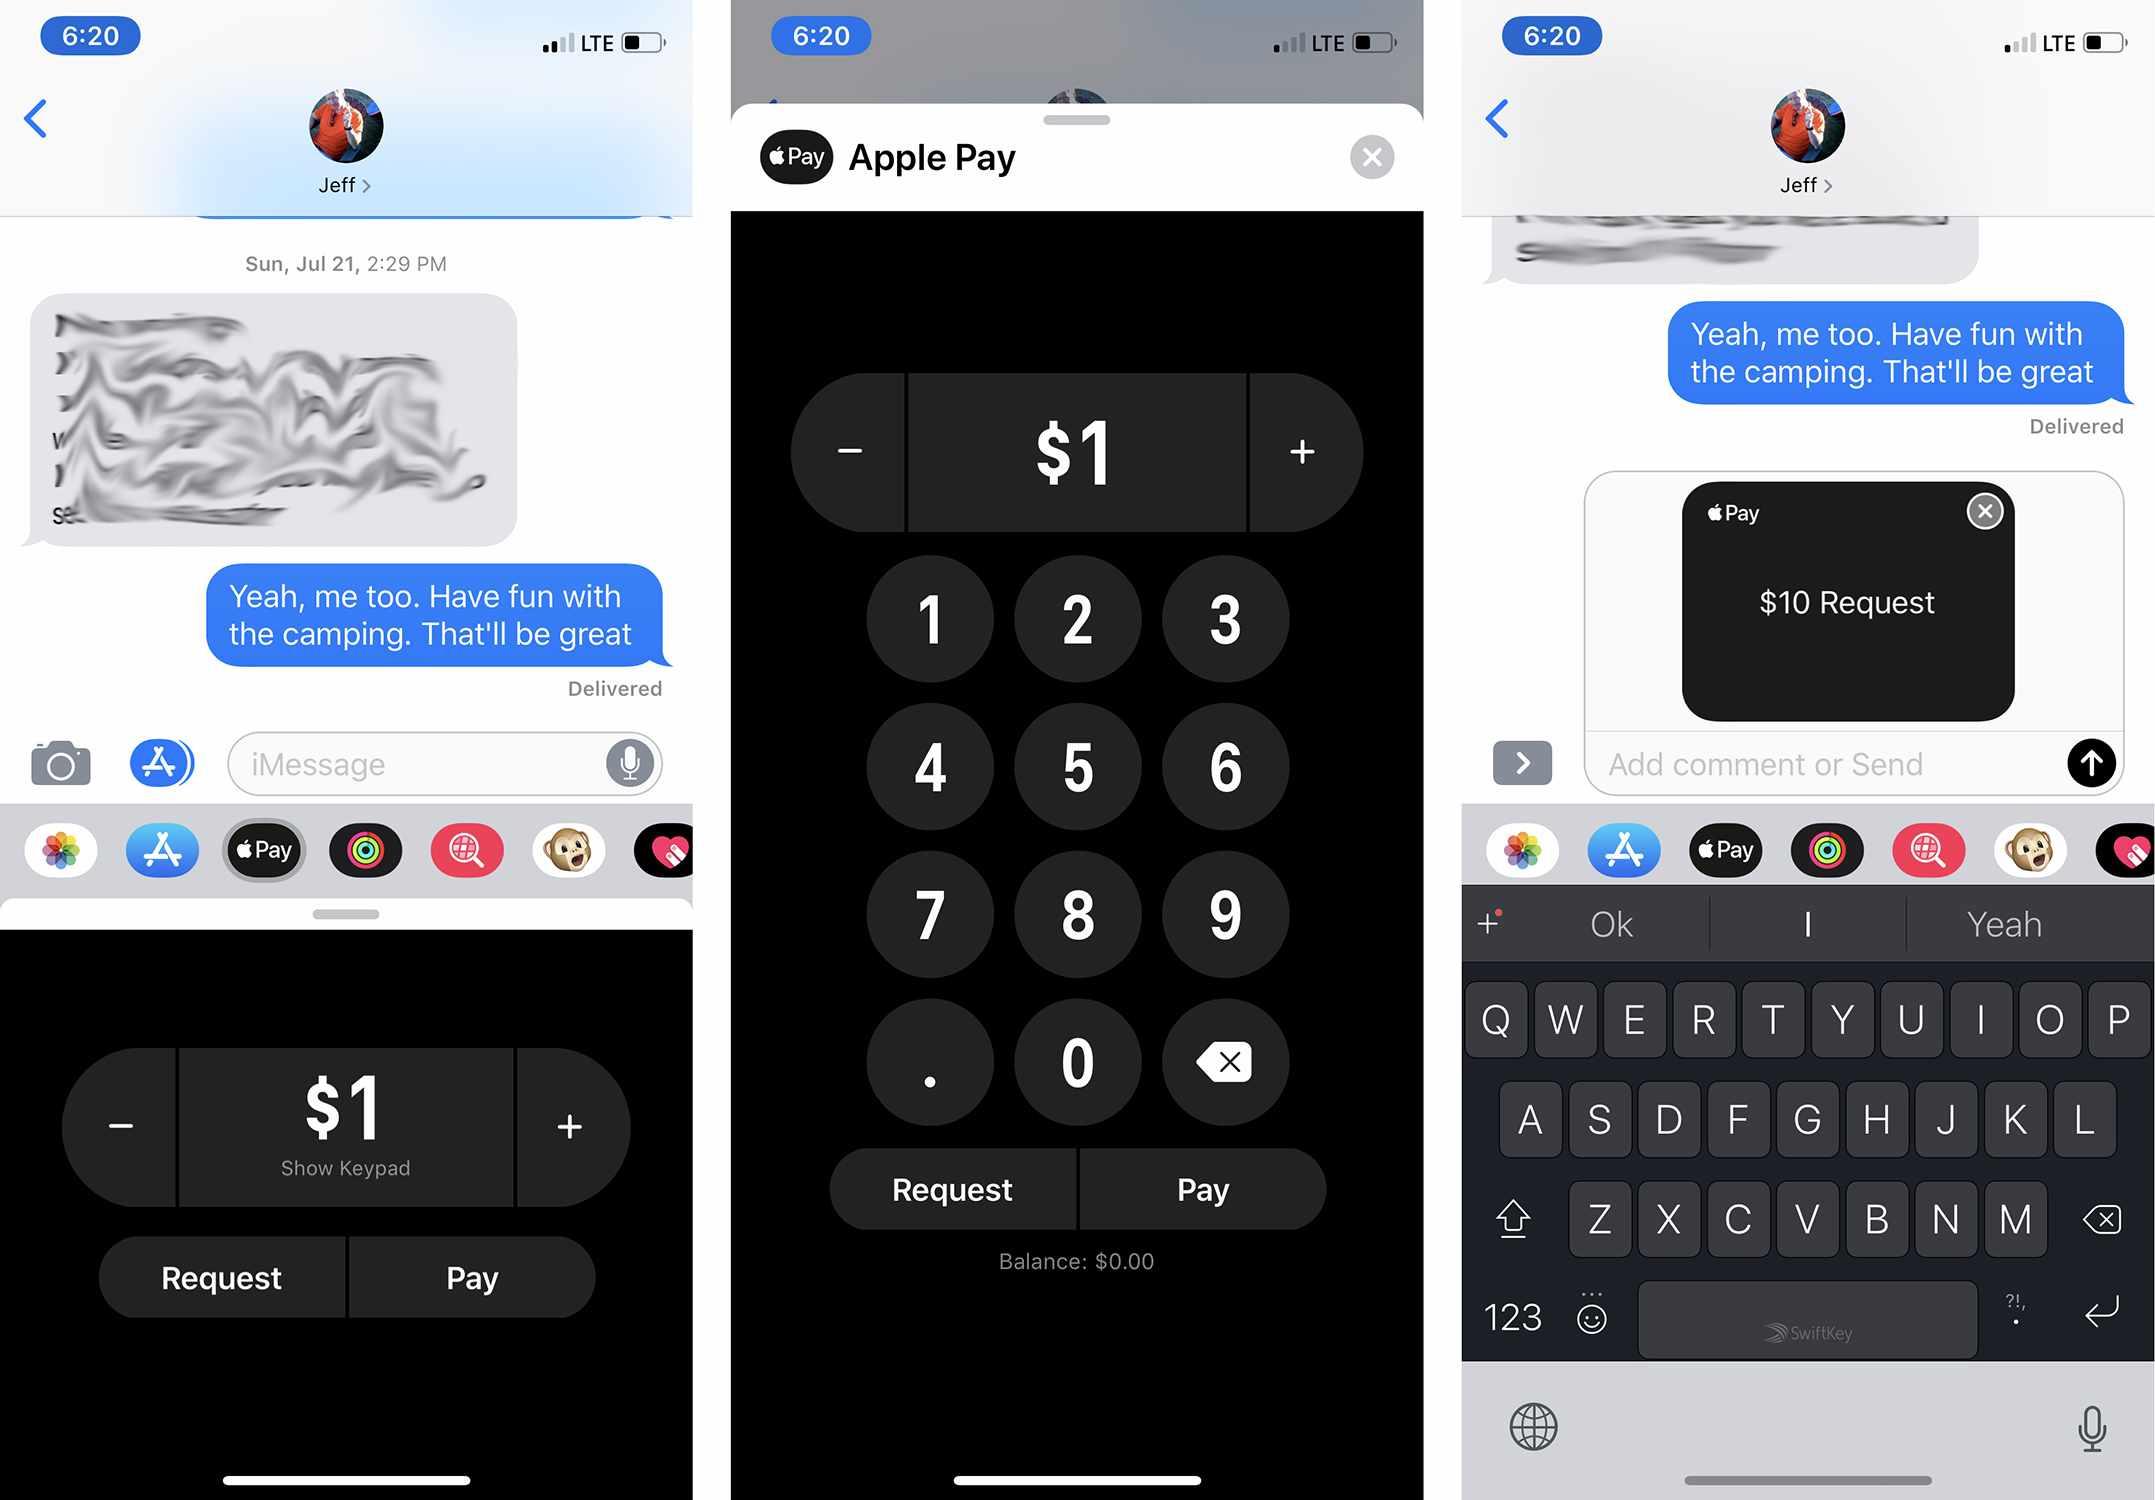 Screenshots of requesting money using Apple Pay Cash